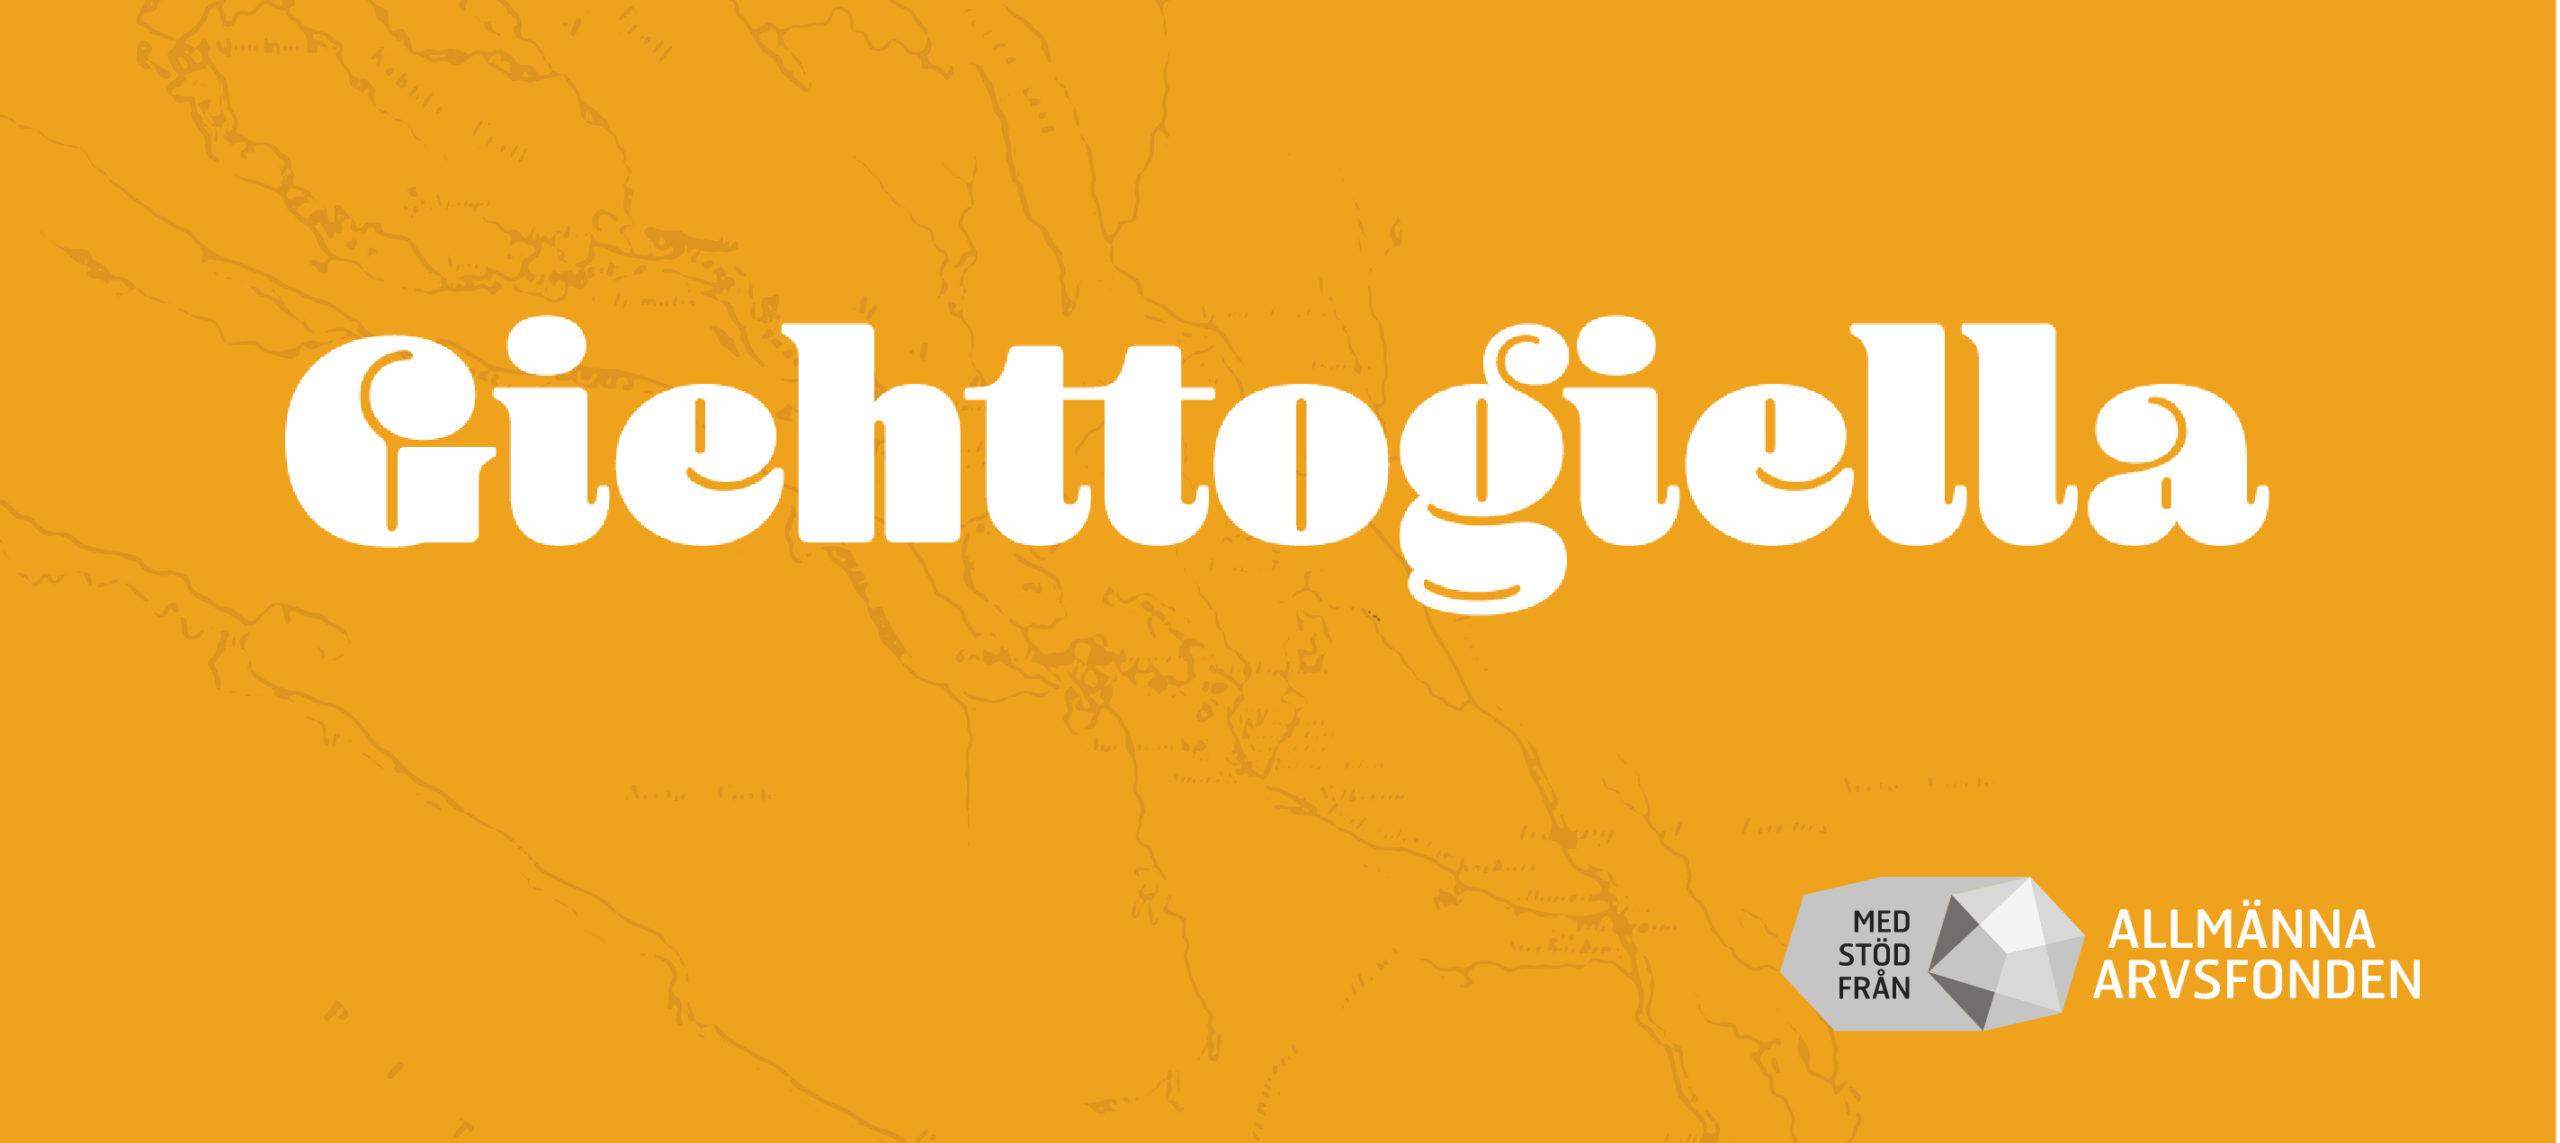 Logotyp Giehttogiella